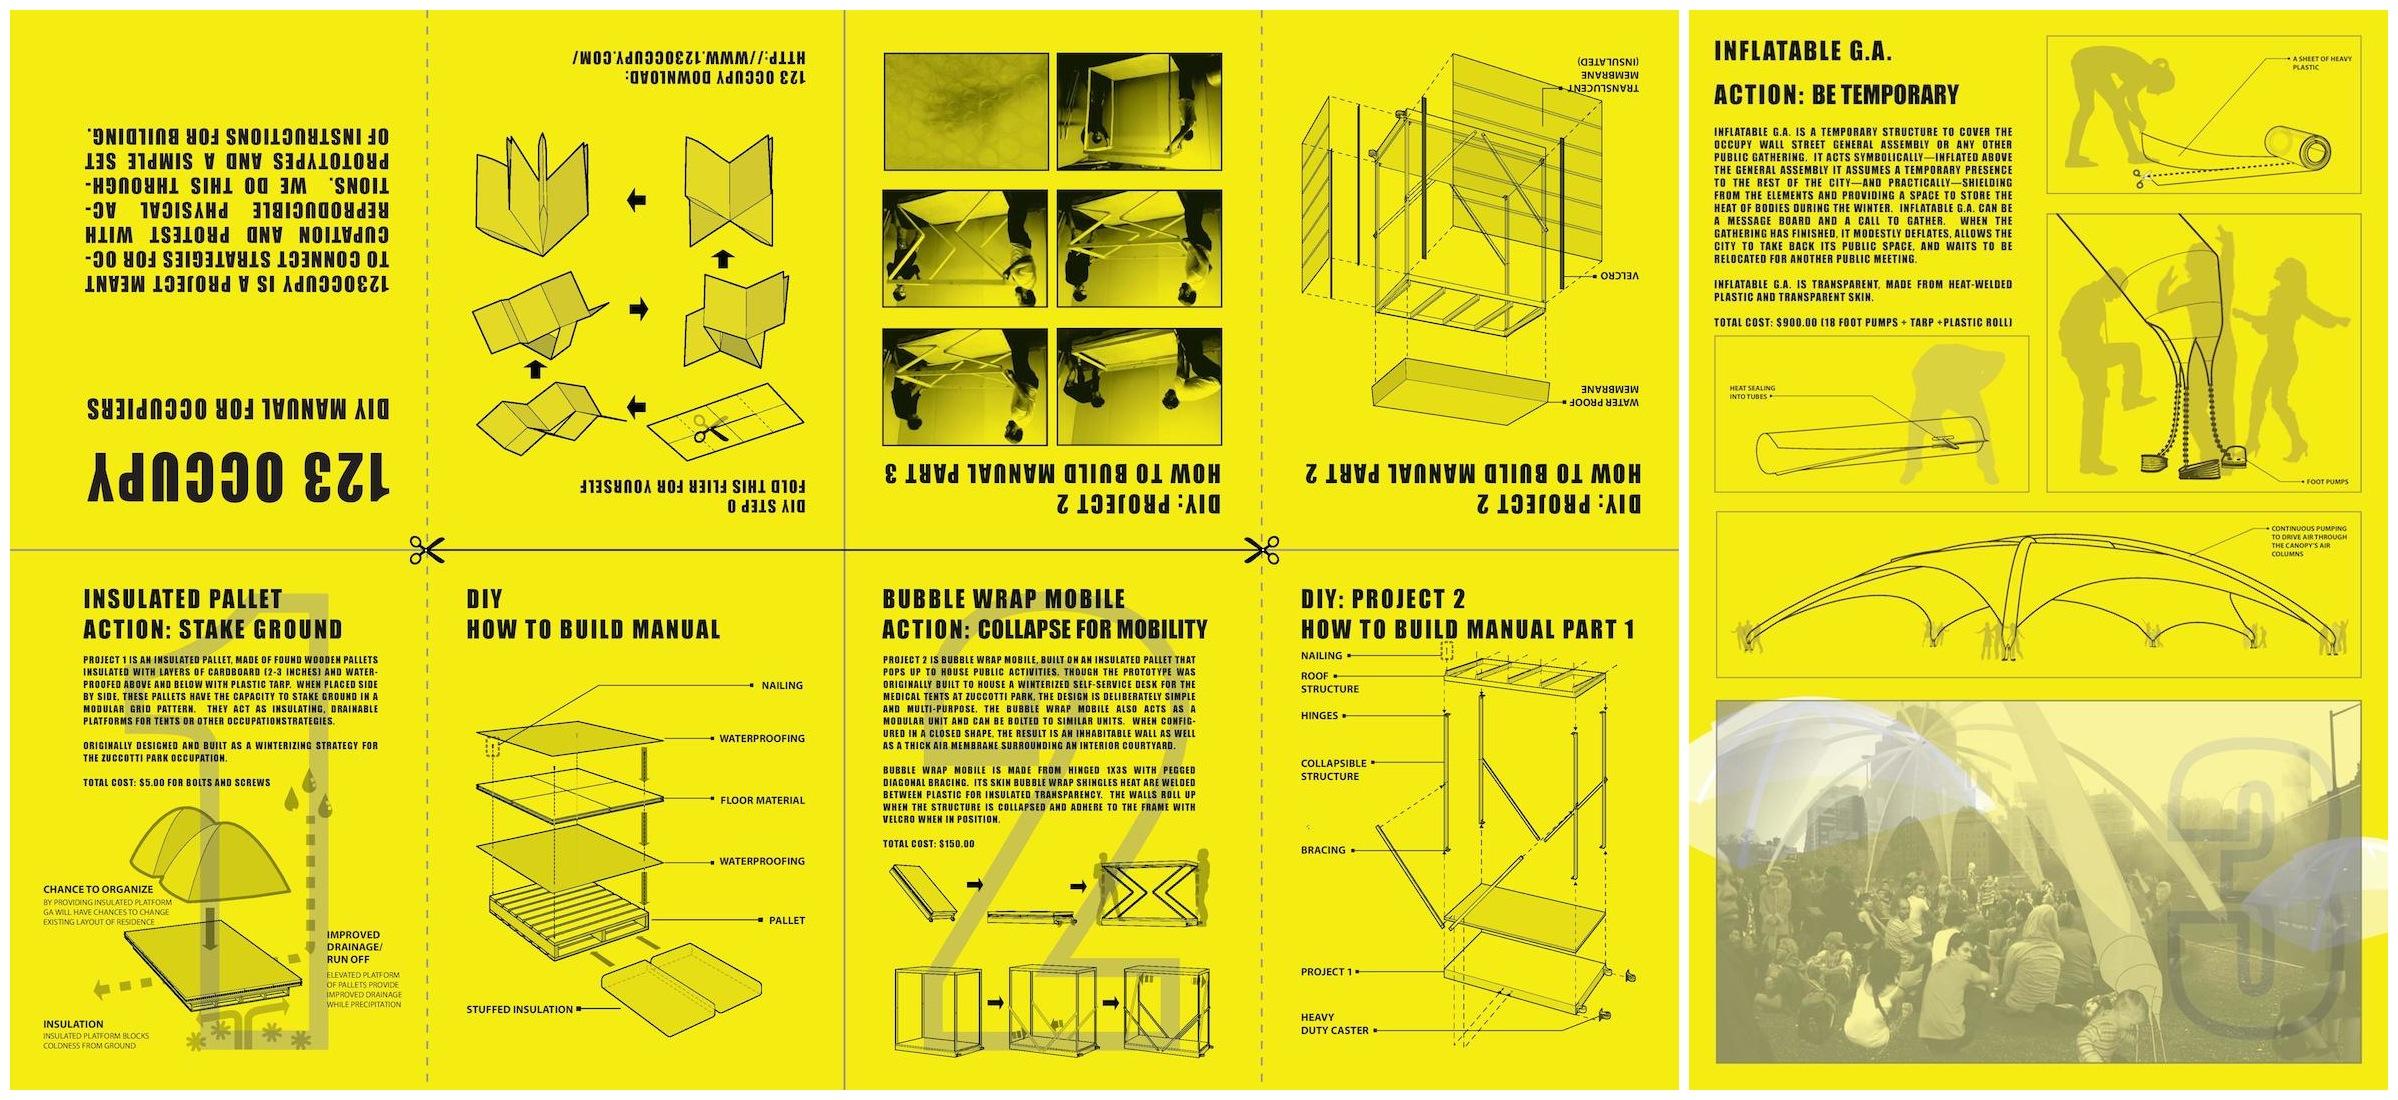 Chandelier Diy Manual Guide